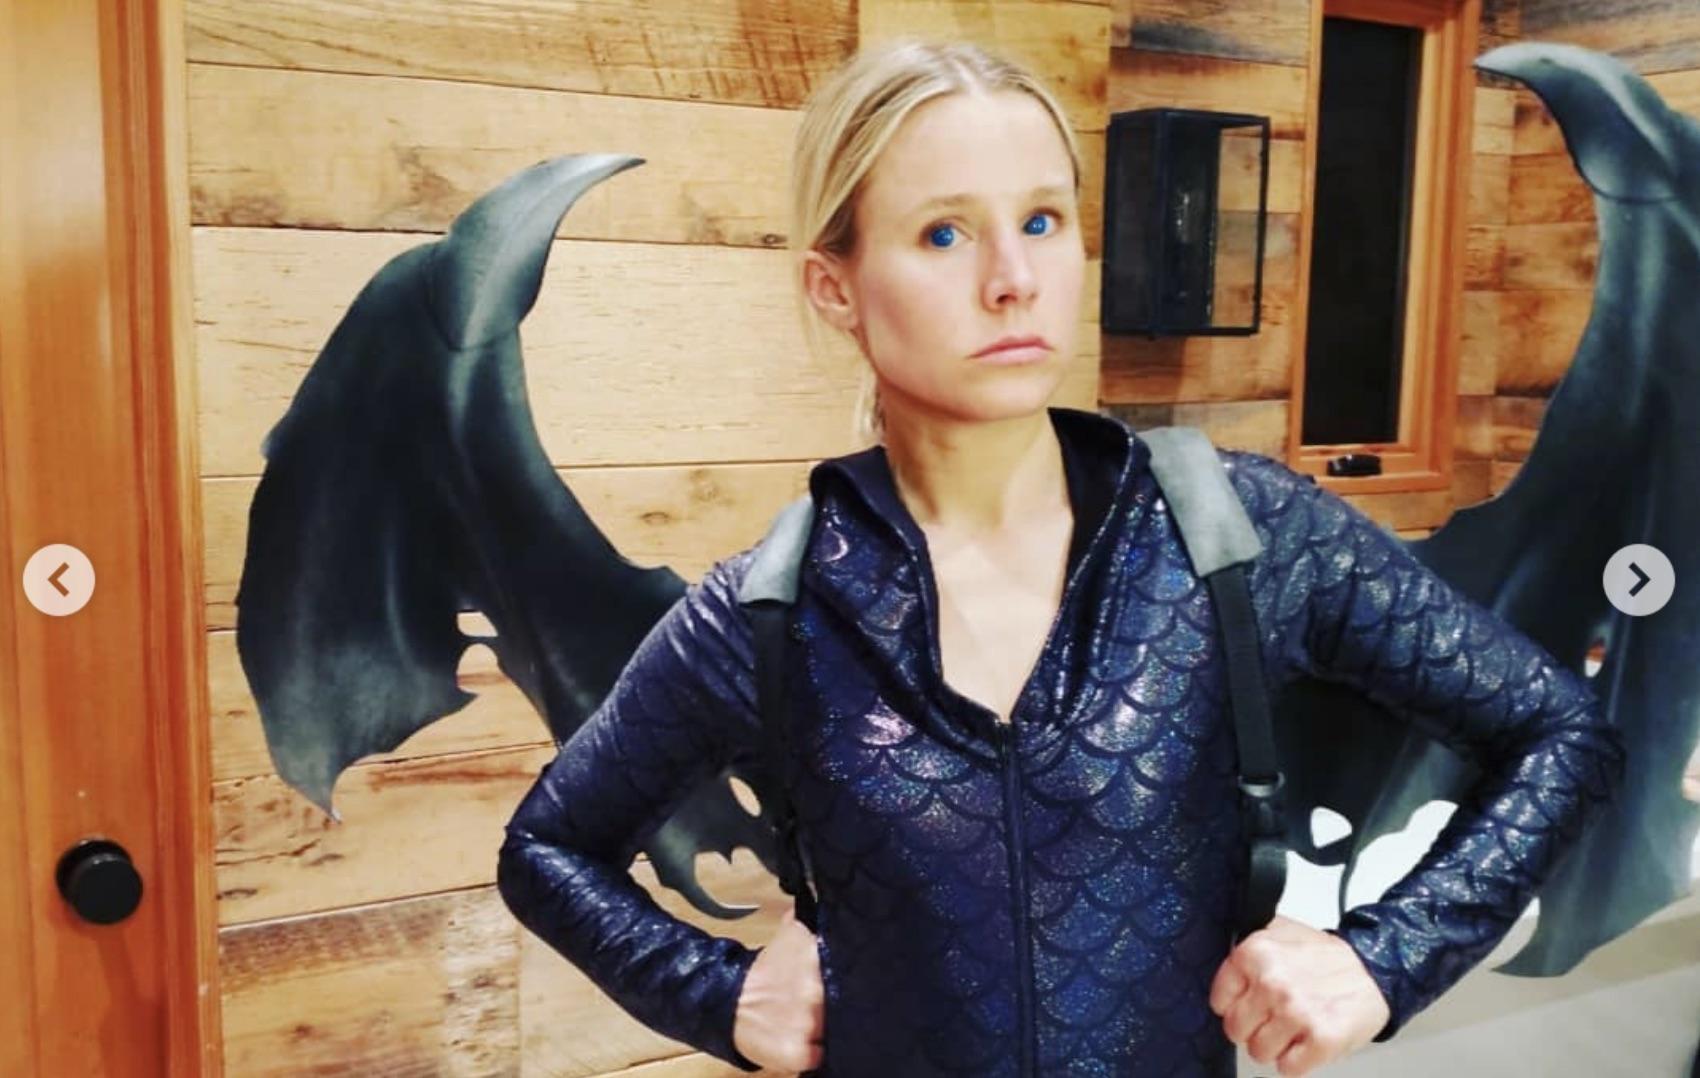 Kristen Bell in Game of Thrones costume